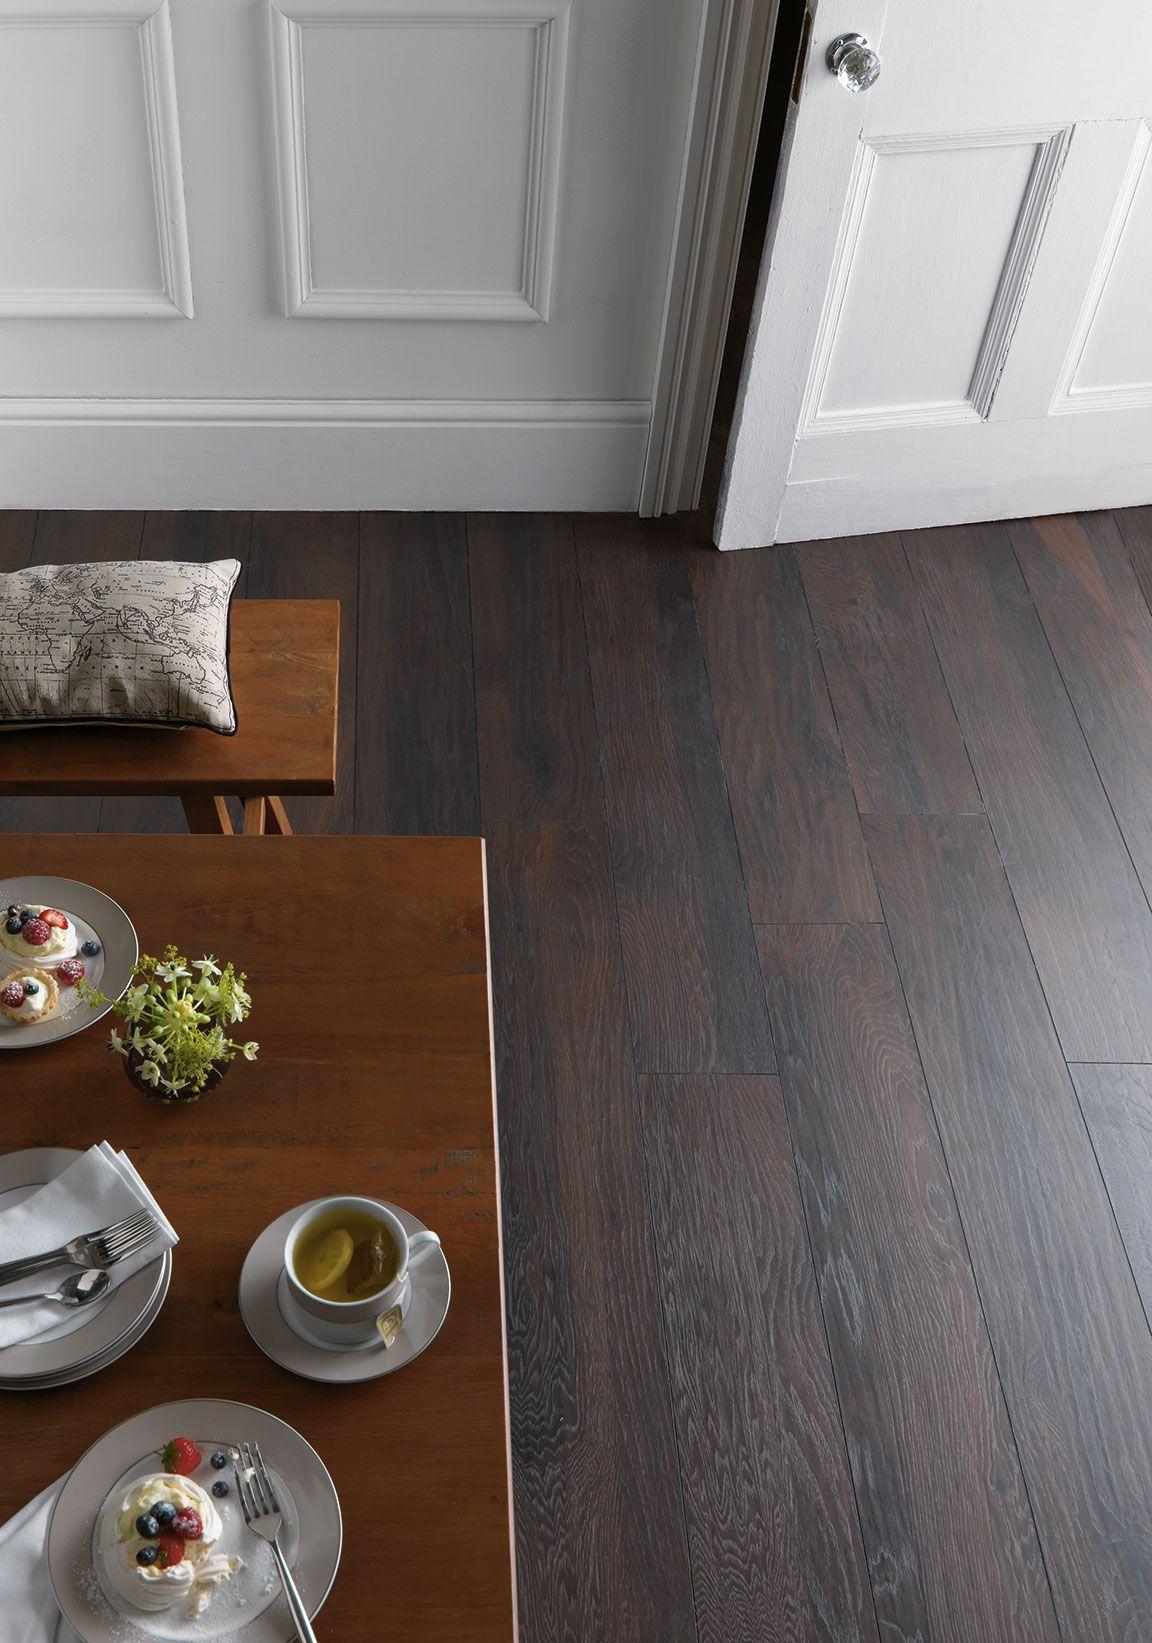 Schreiber Smokey Mountain Hickory Laminate Flooring 1.73